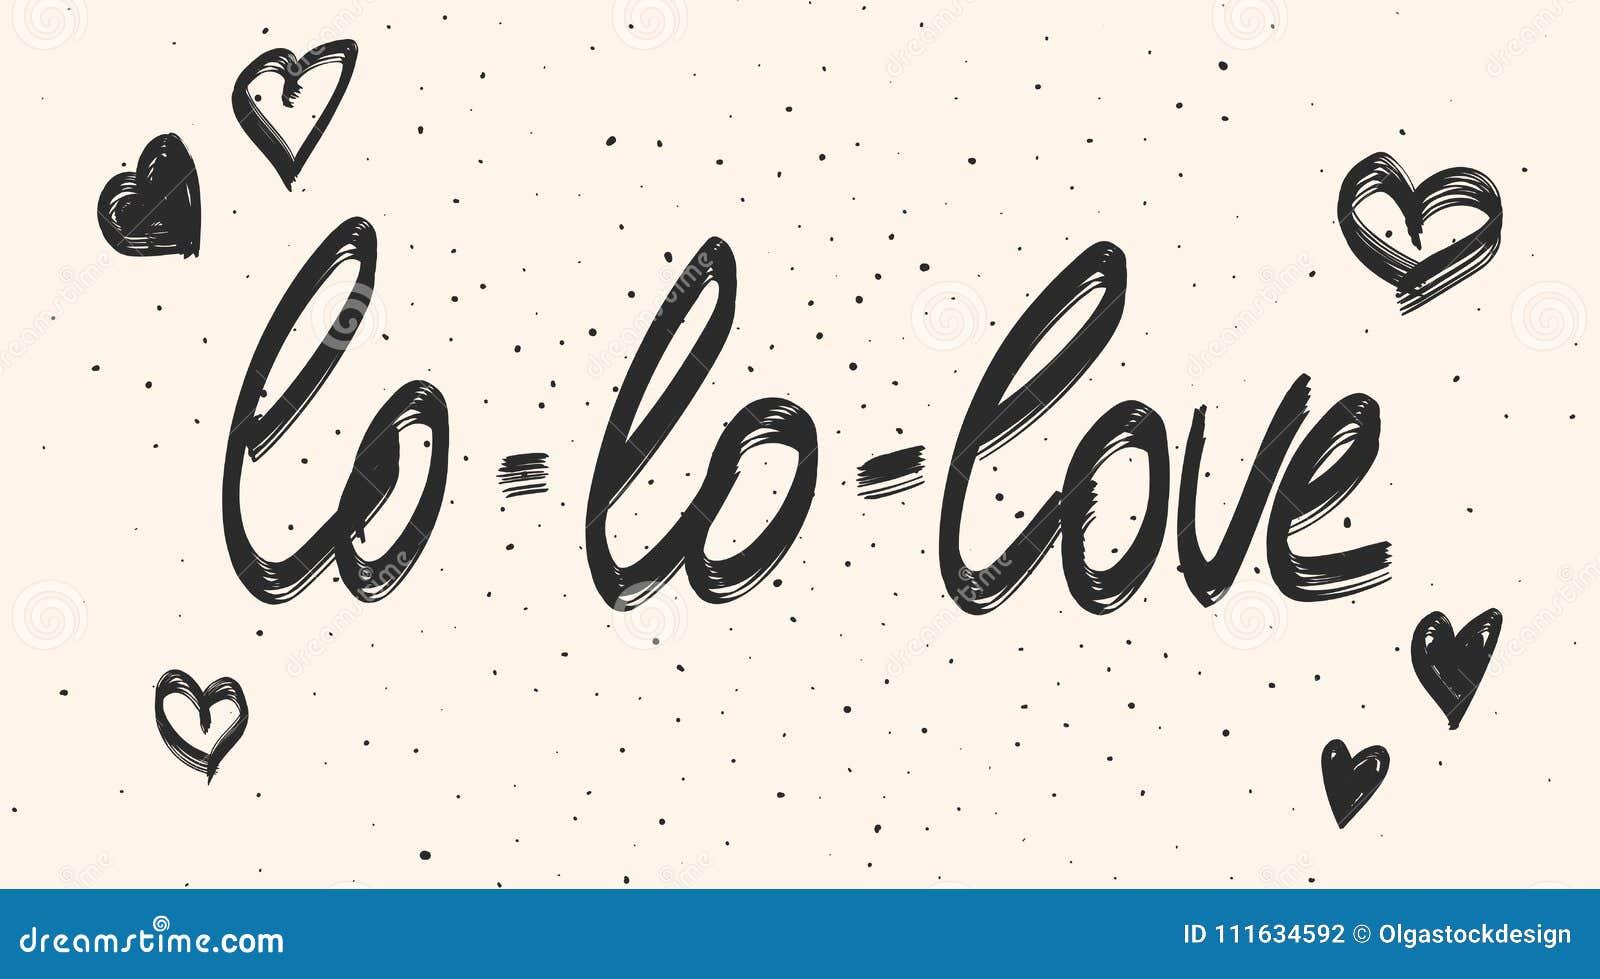 Frase Da Caligrafia Do Amor Vector O Texto Preto Da Tipografia E